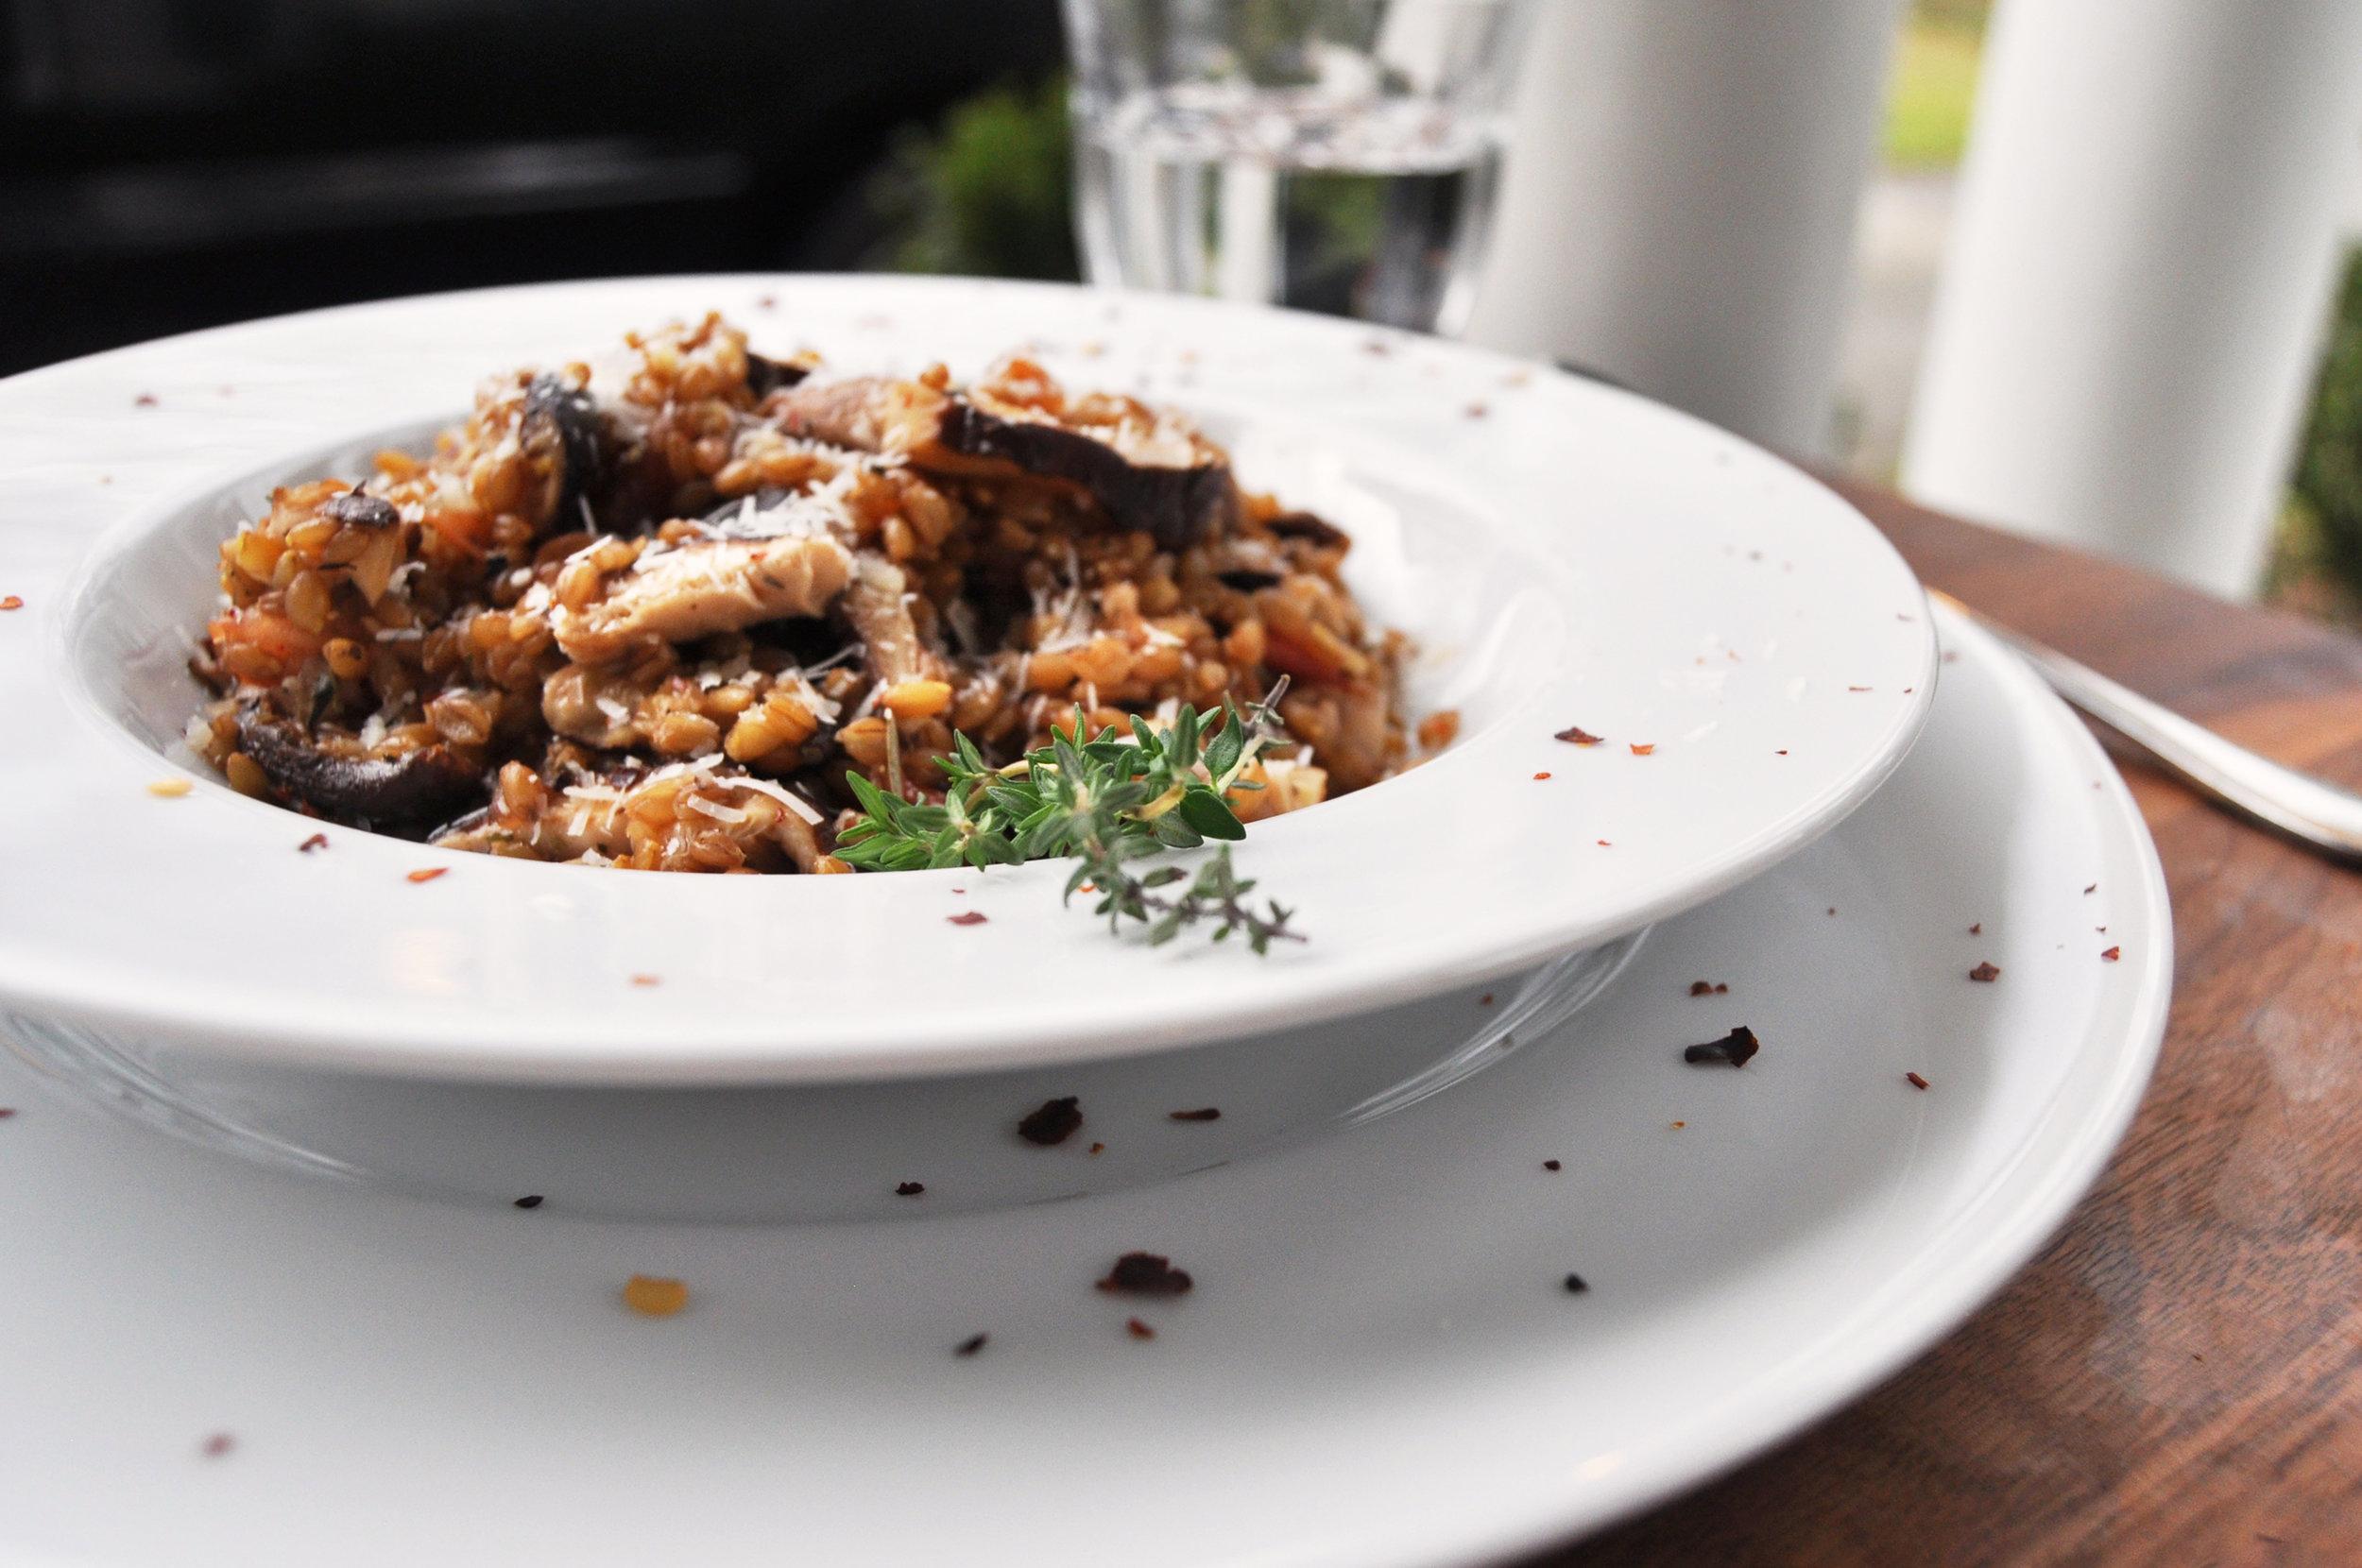 anson-mills-farro-risotto-mushrooms.jpg